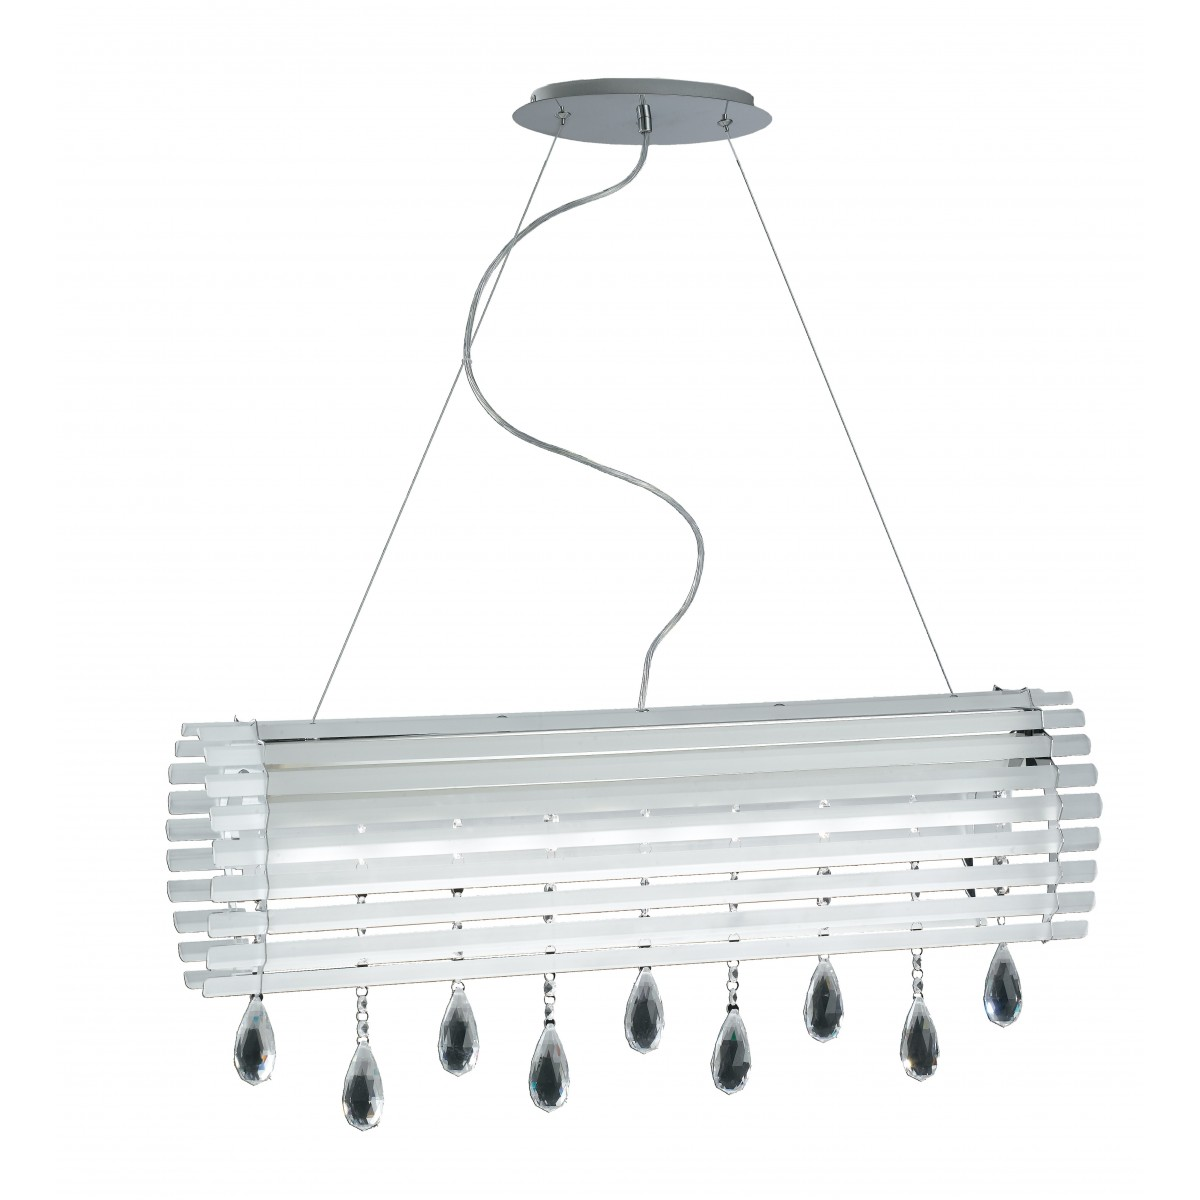 LED-SAMARA-S80 - Lampadario sospeso Vetro finiture Cromo Cristallo a Goccia Moderno 40 watt Luce Naturale